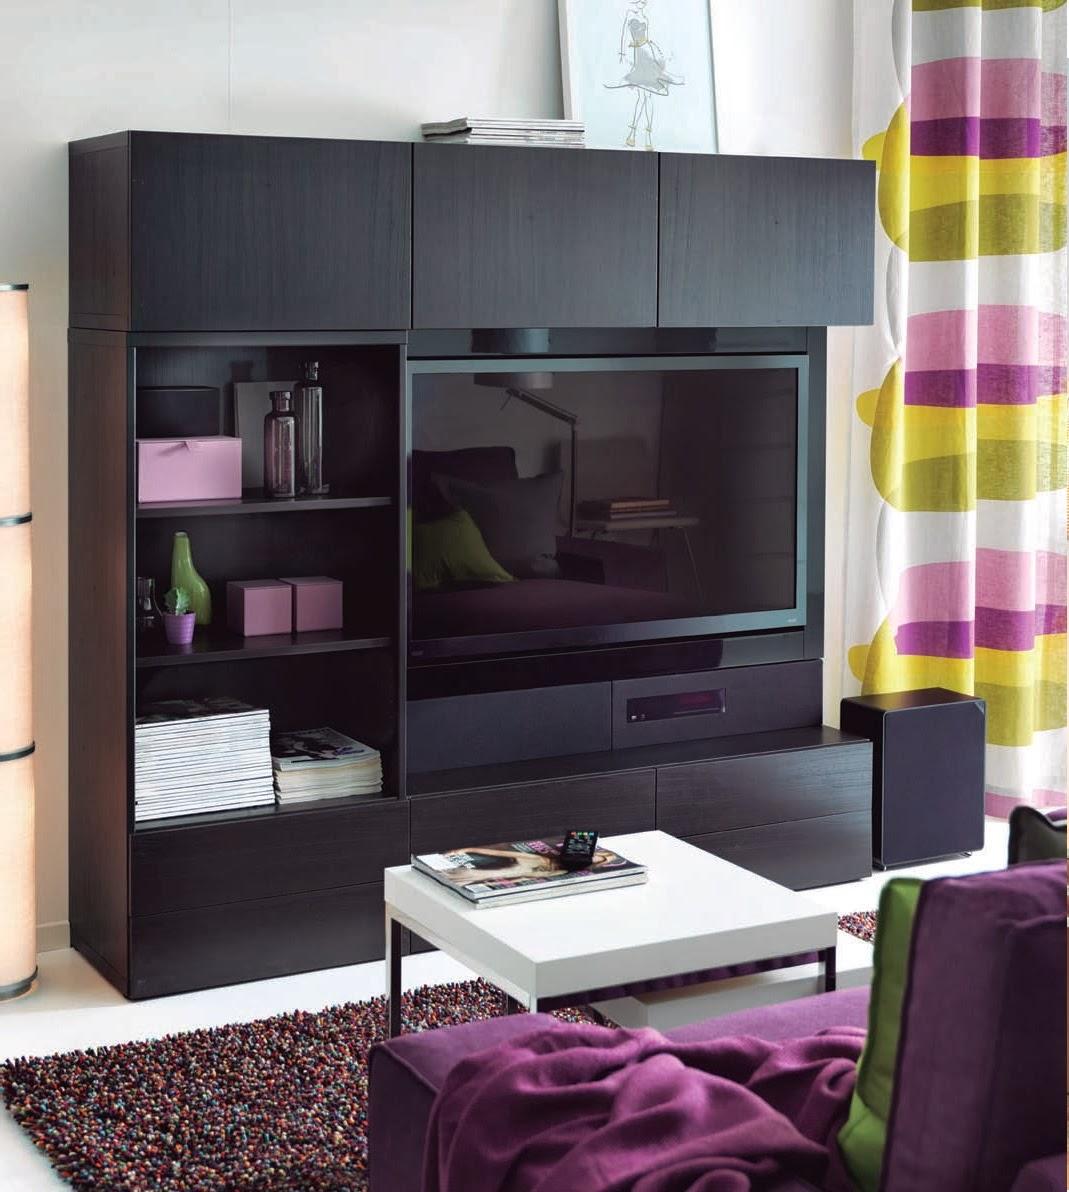 Salas De Estar En Ikea ~ Março 2014  Miau  ideias de decoração